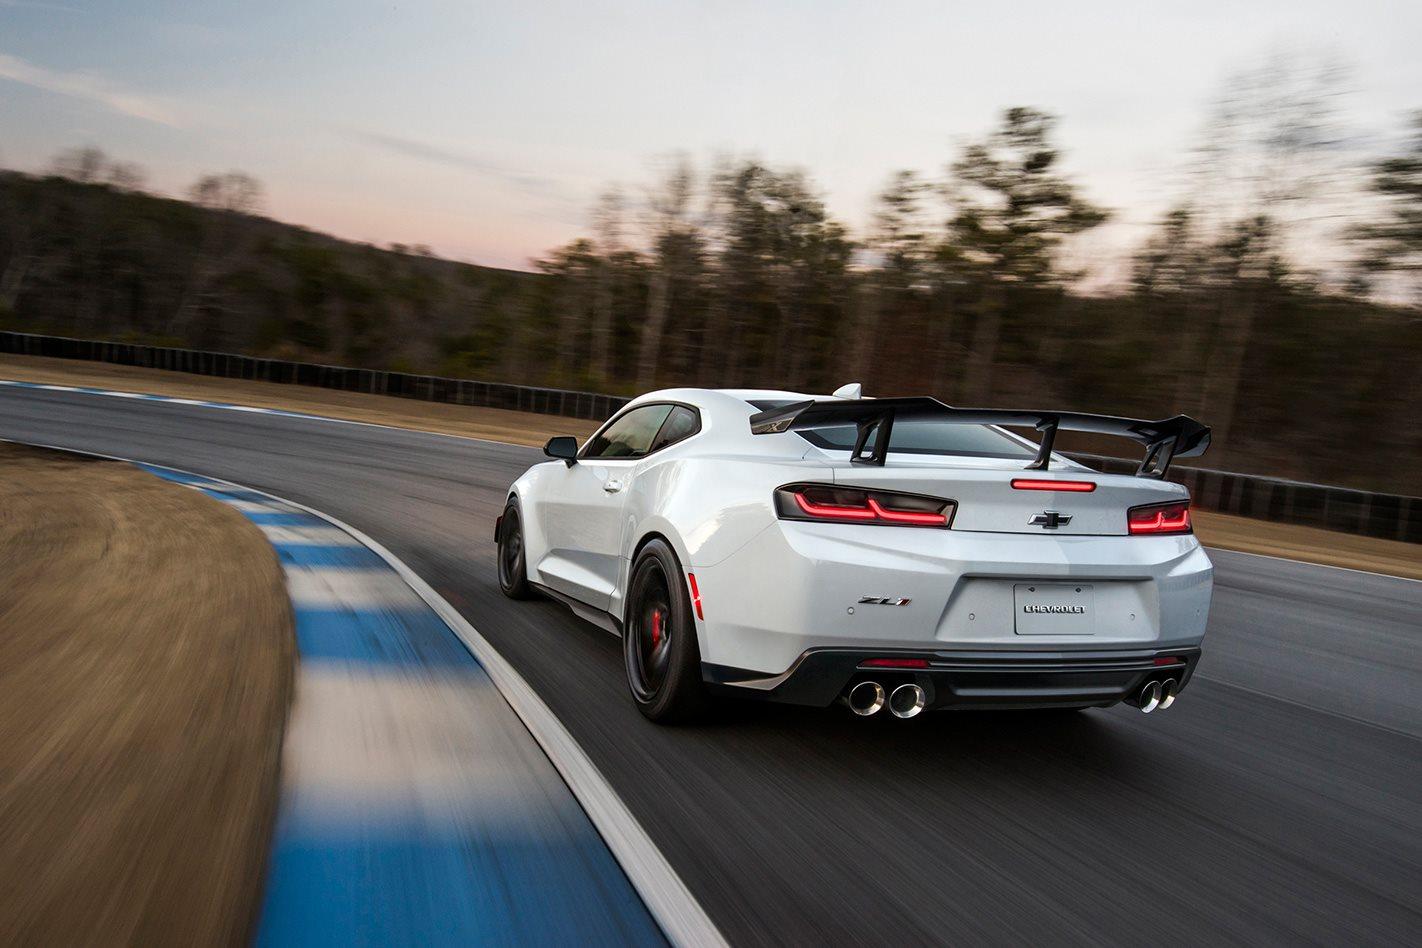 2018-Chevrolet-Camaro-ZL1-1LE-rear.jpg